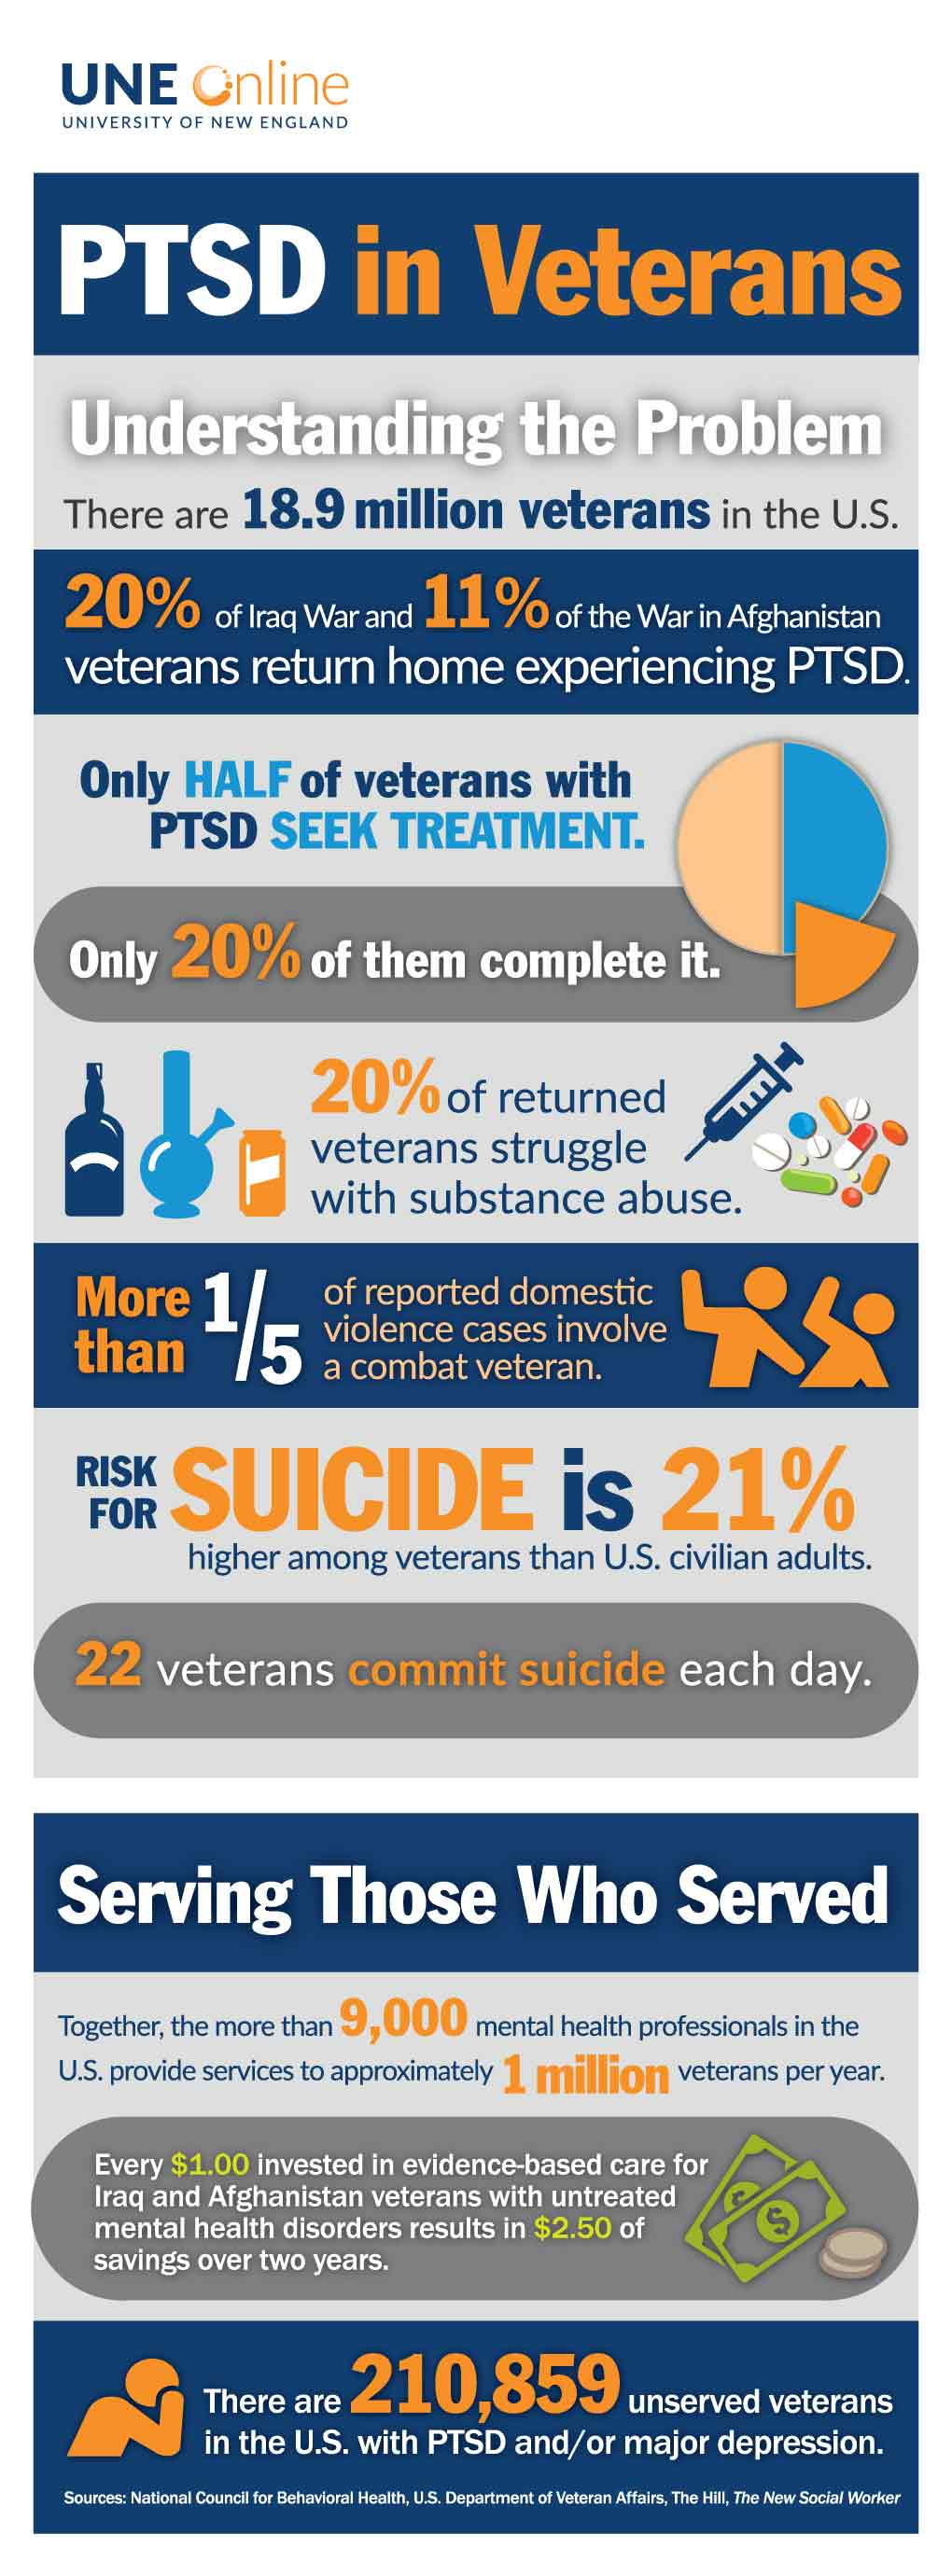 PTSD infographic describing PTSD among veterans, good for trauma studies graduate programs